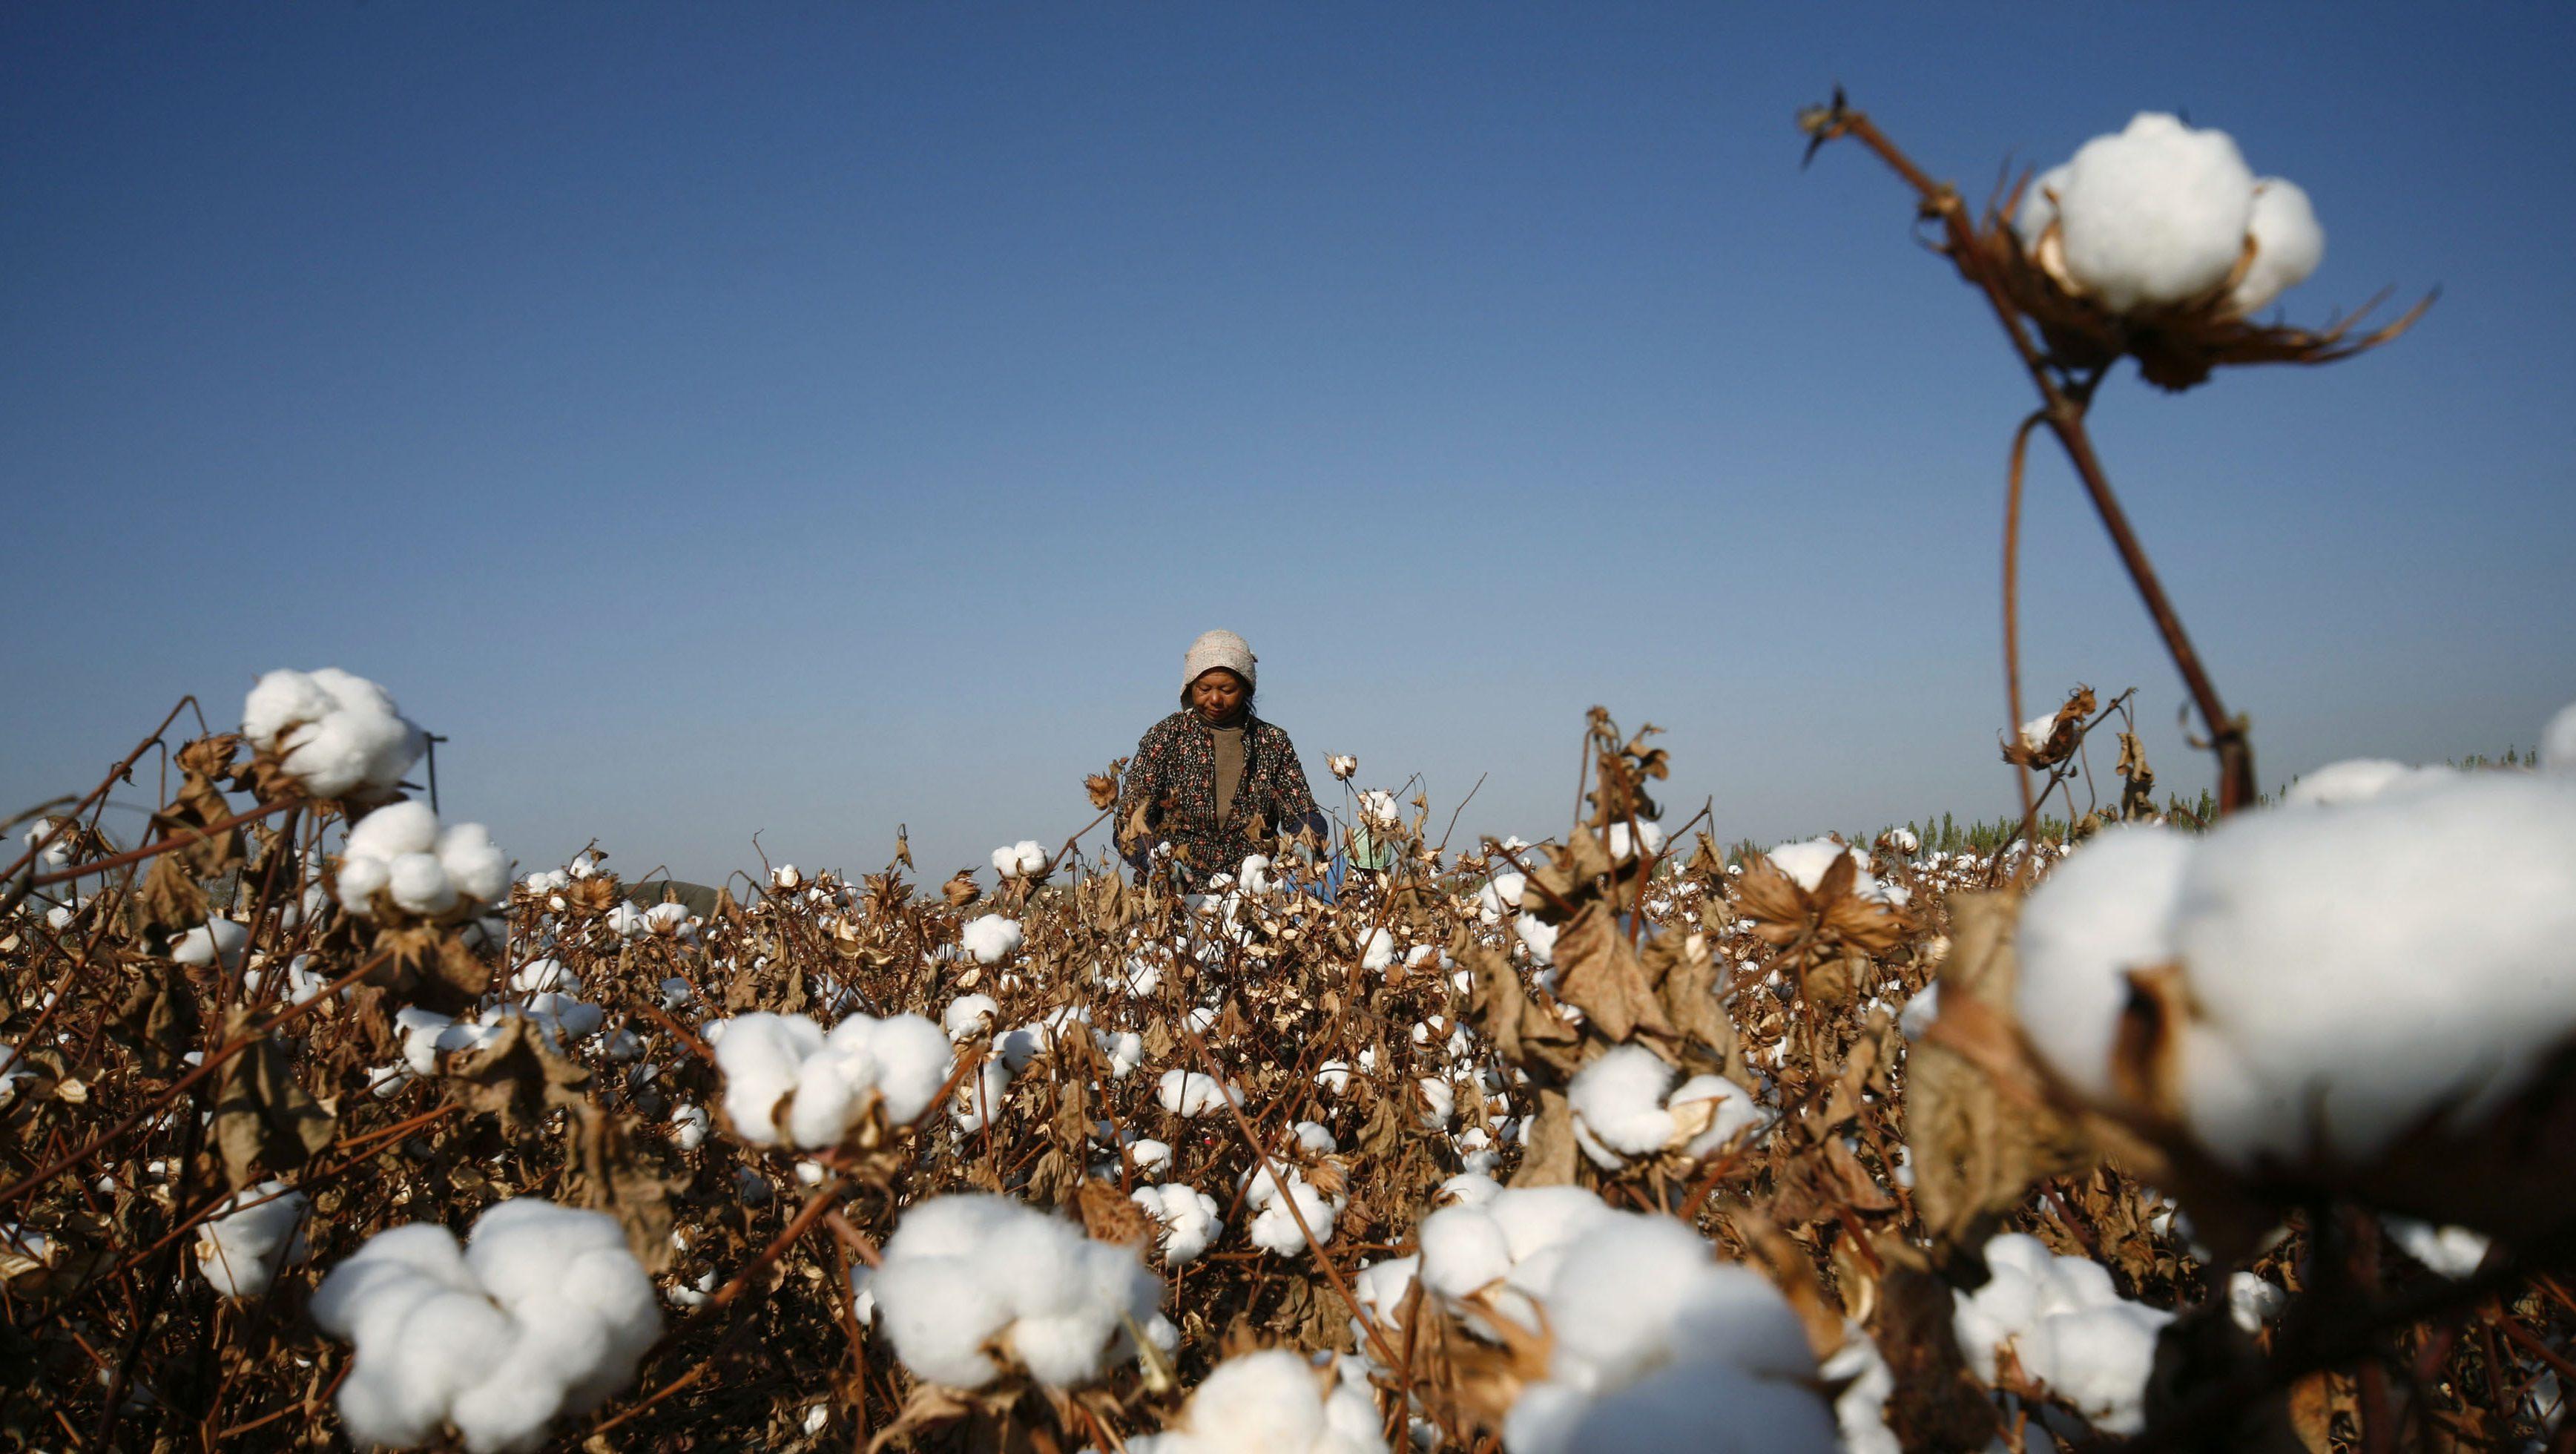 A worker picks cotton